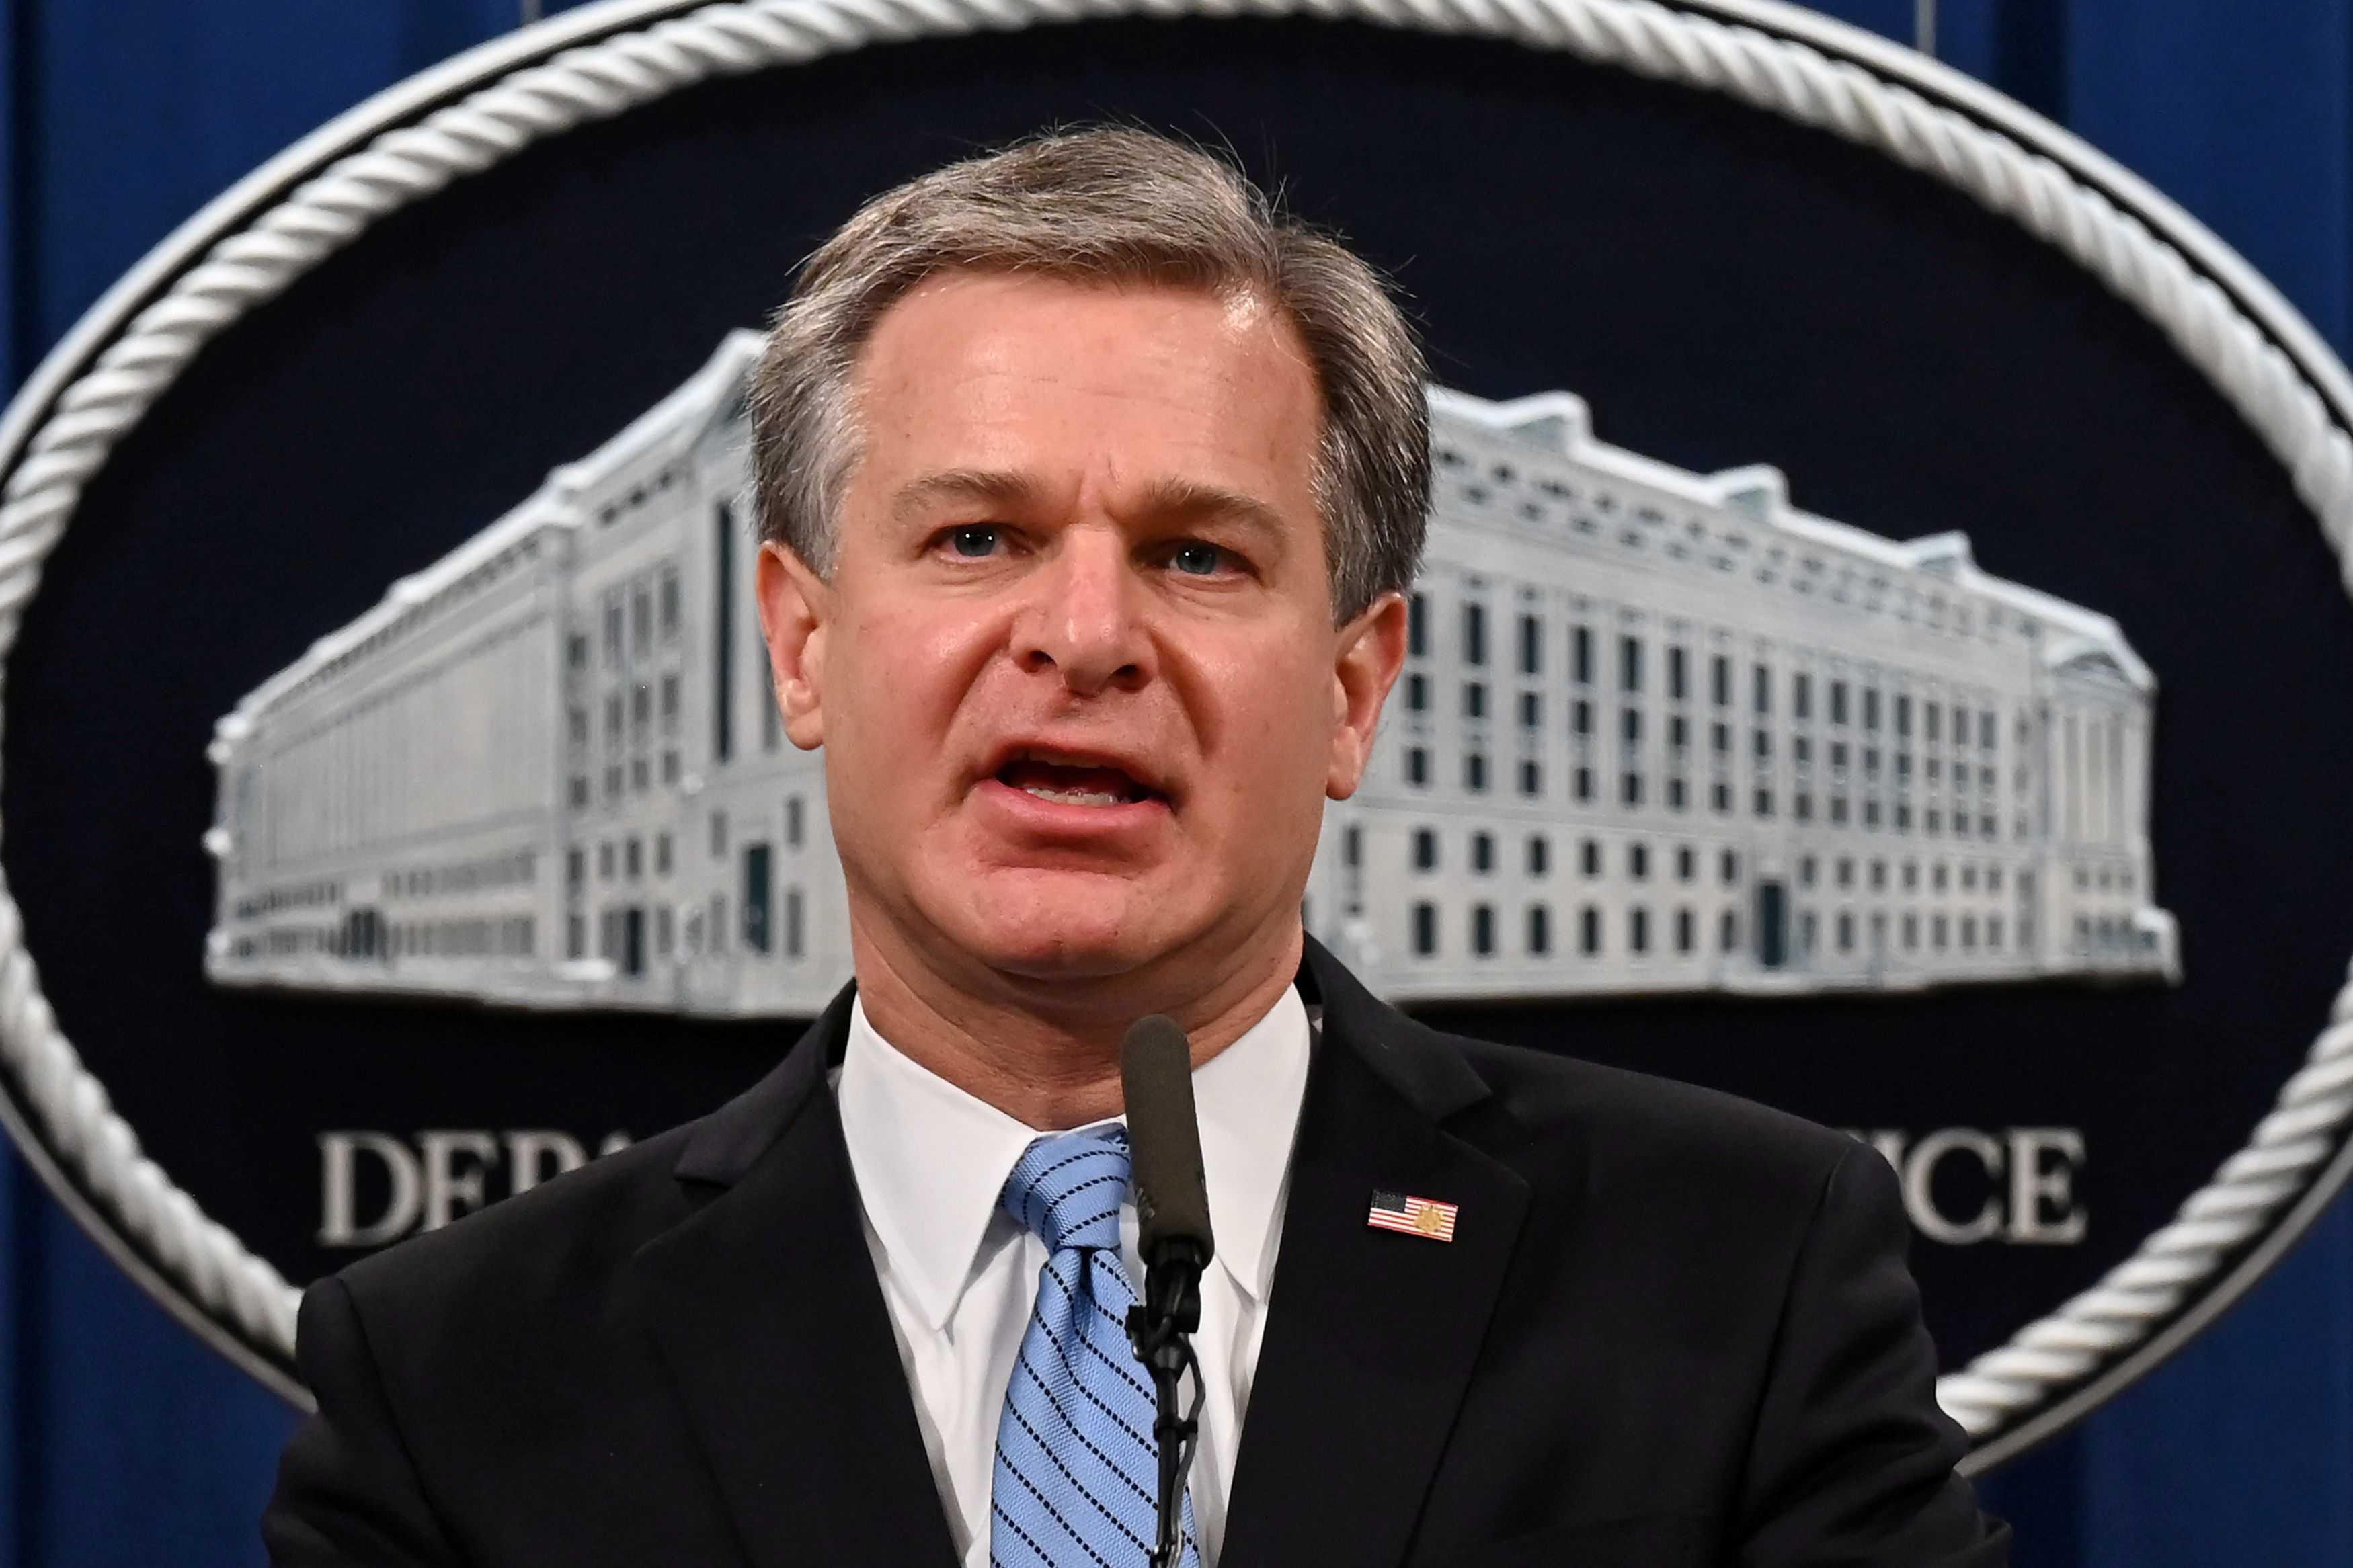 FBI Director: Capitol Siege Was 'Domestic Terrorism'